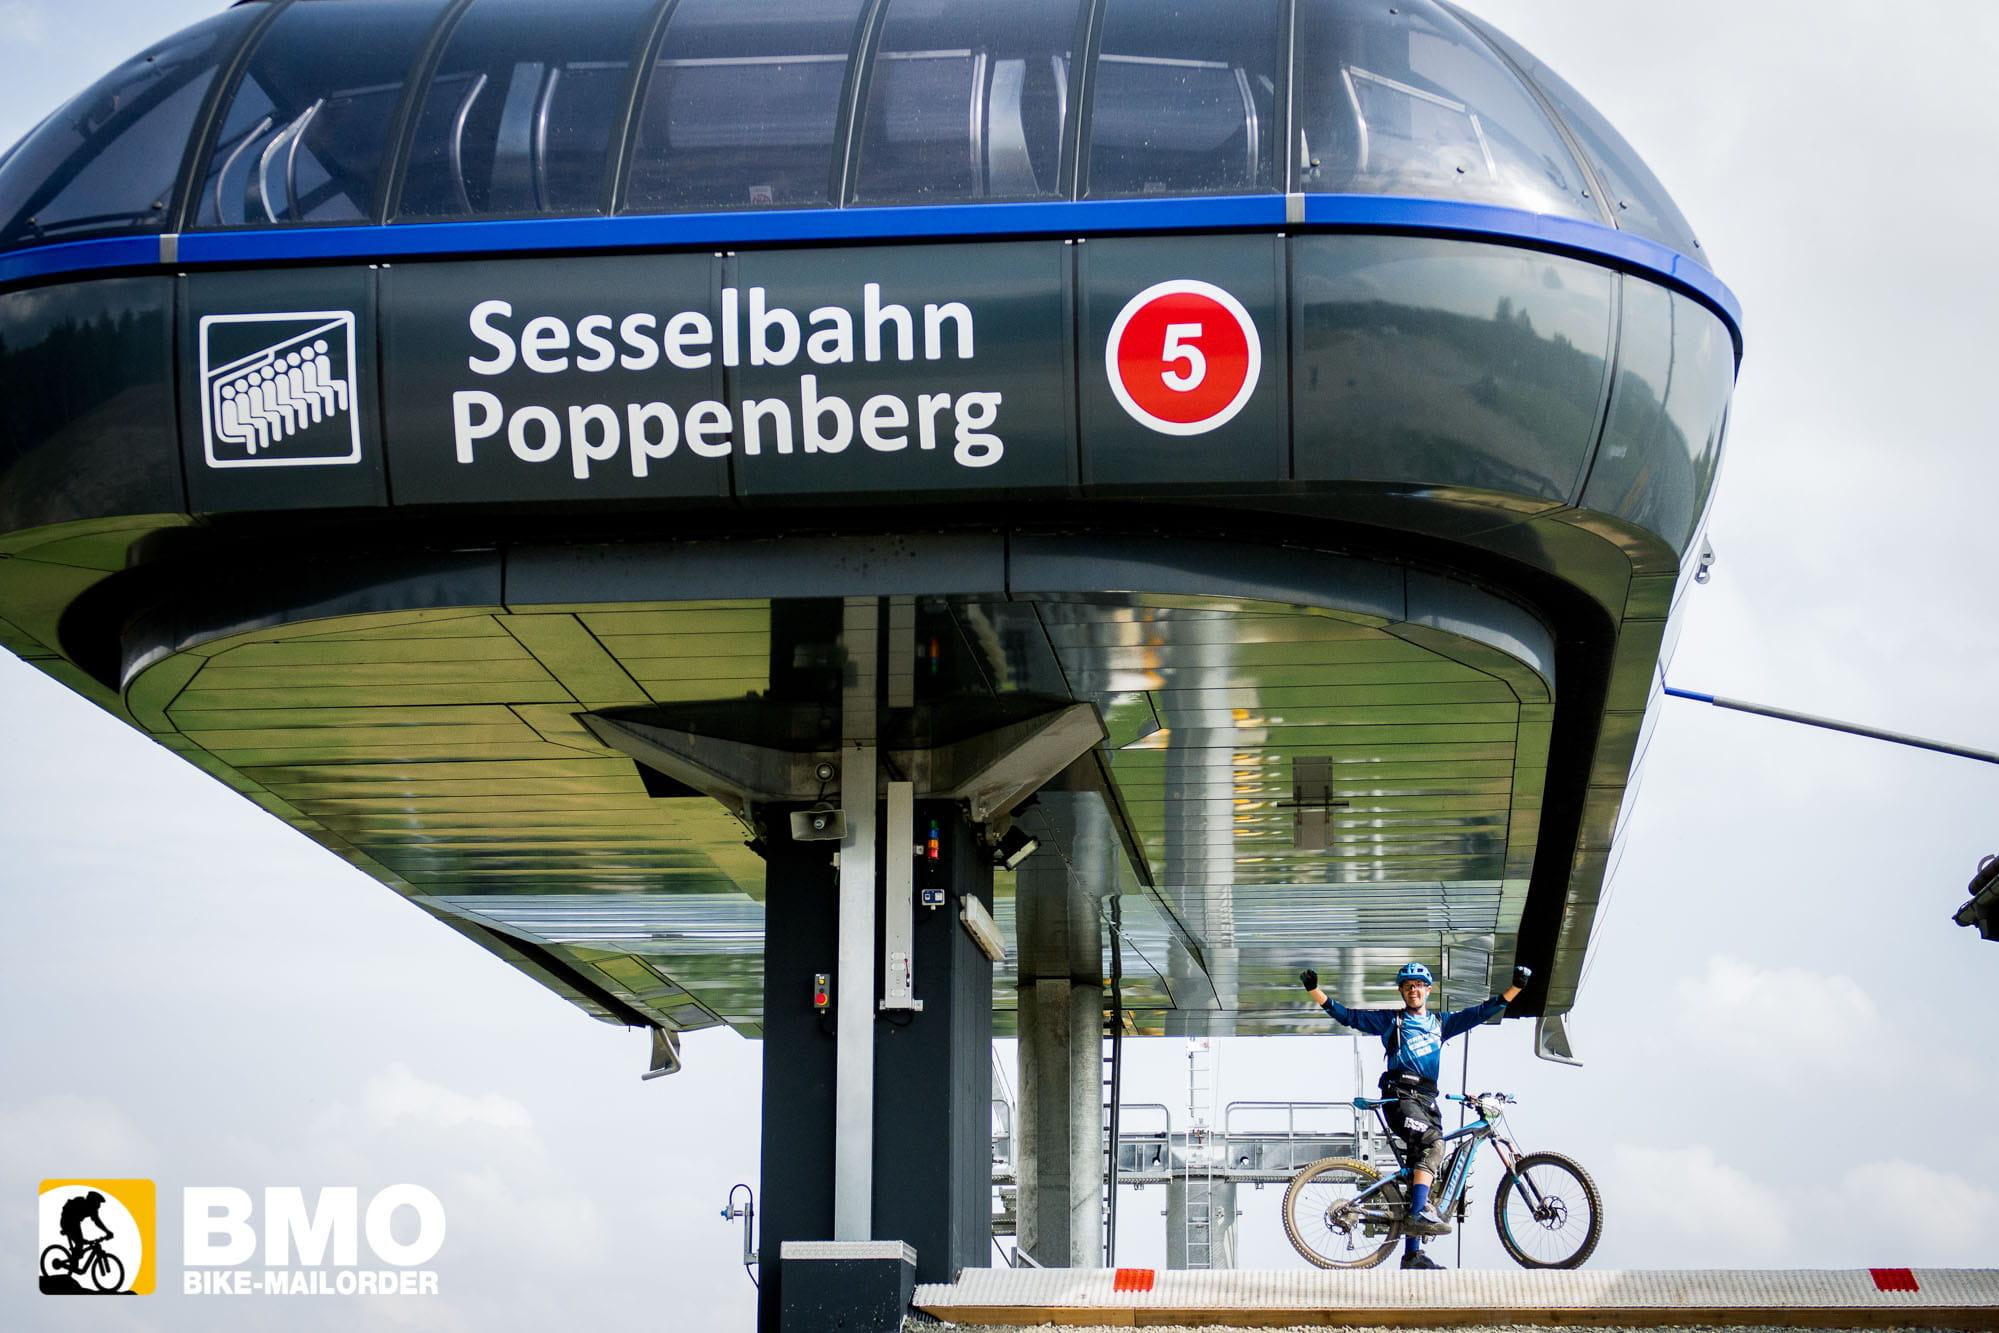 giant_bikemailorder-9